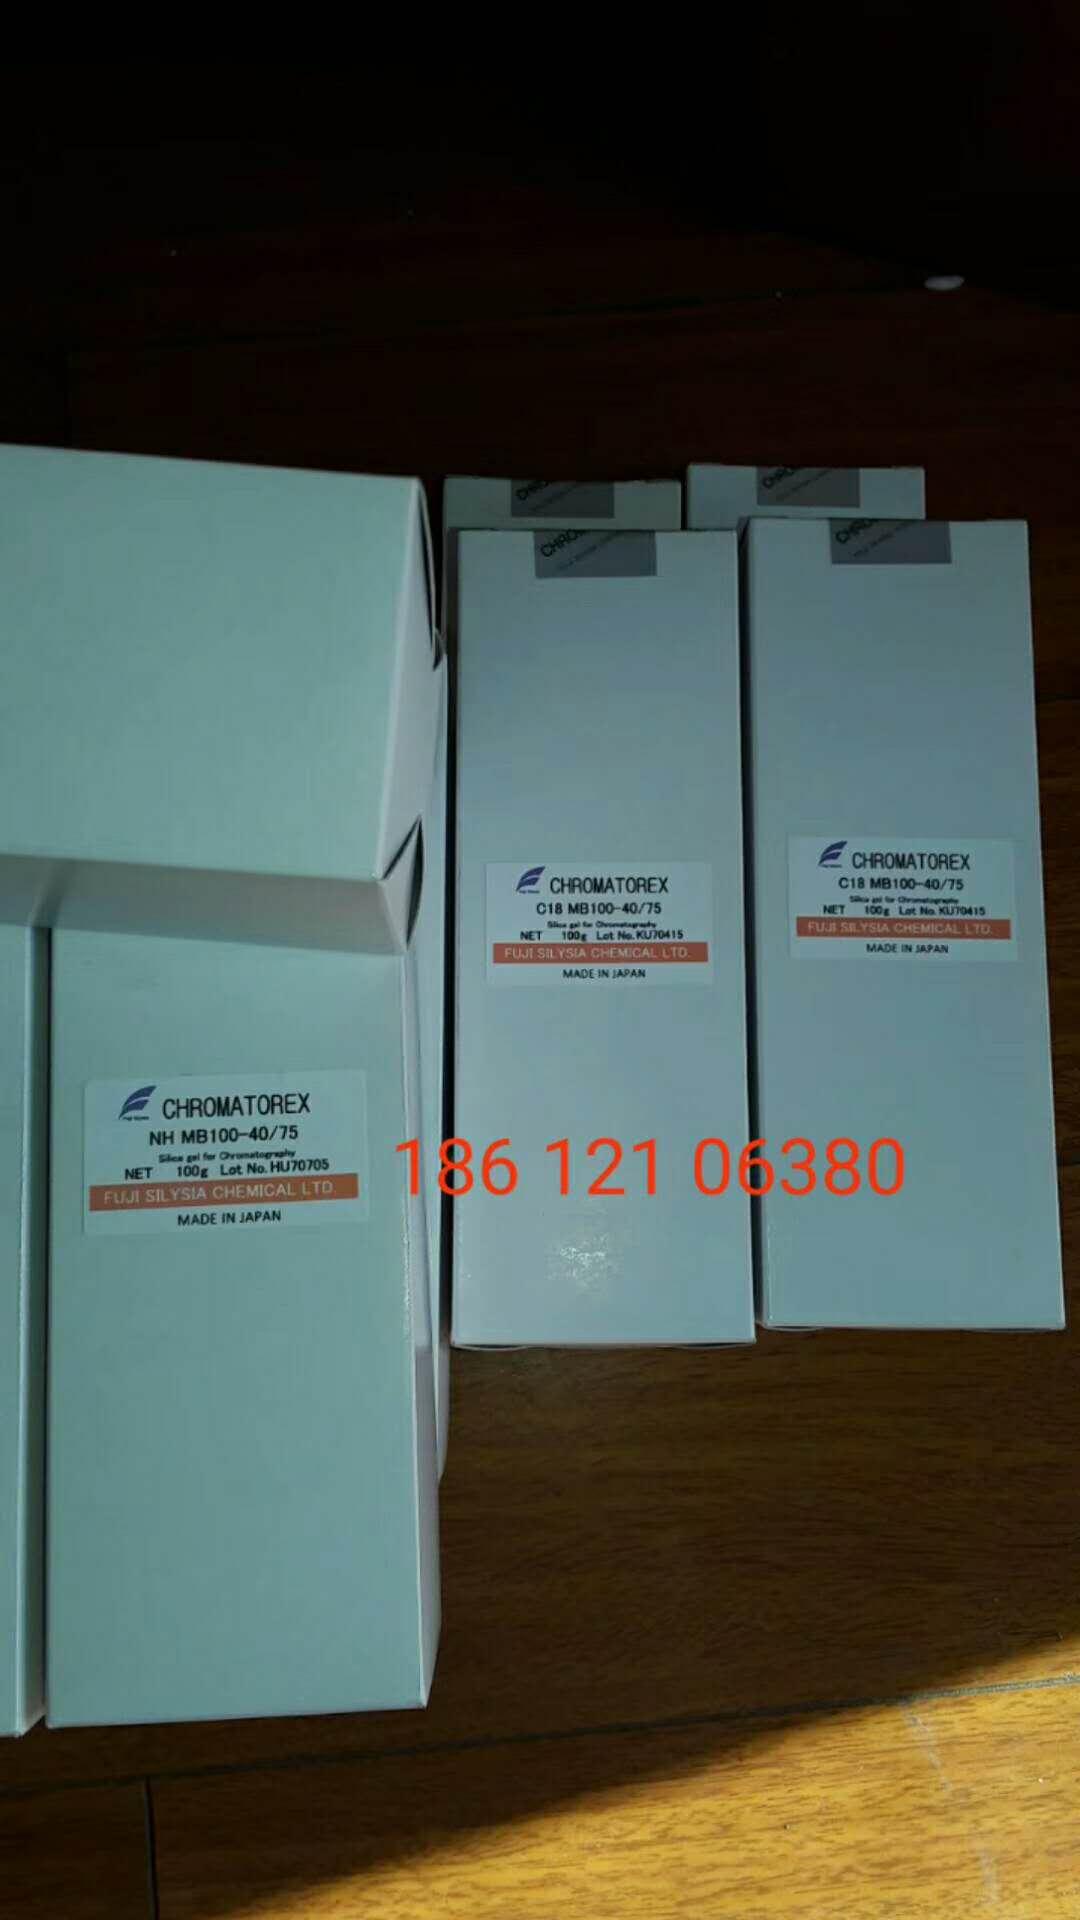 FUJI Chromatorex C4 SPS 300-40/75填料50微米